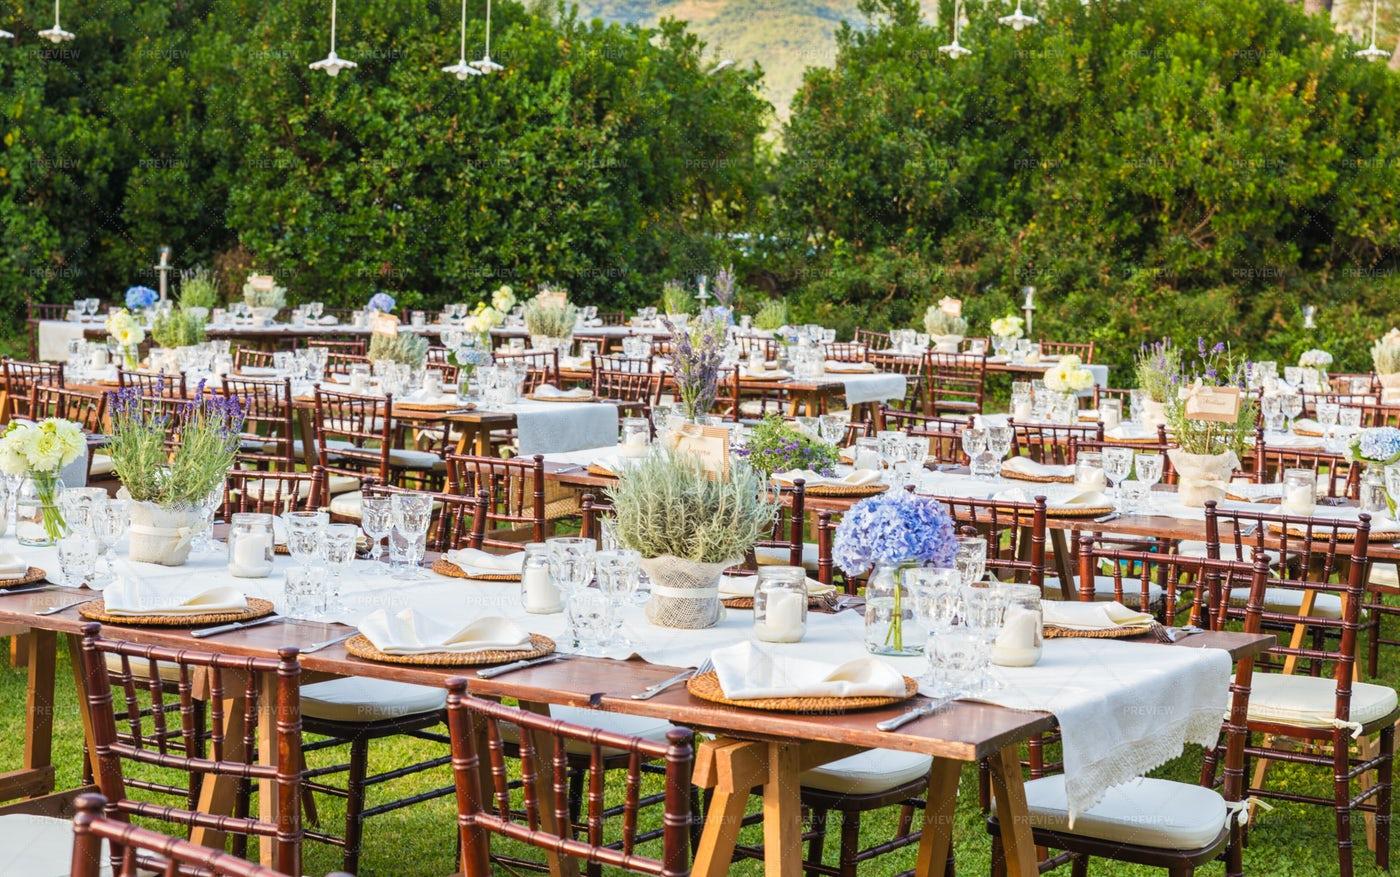 Tables For The Gala Dinner: Stock Photos